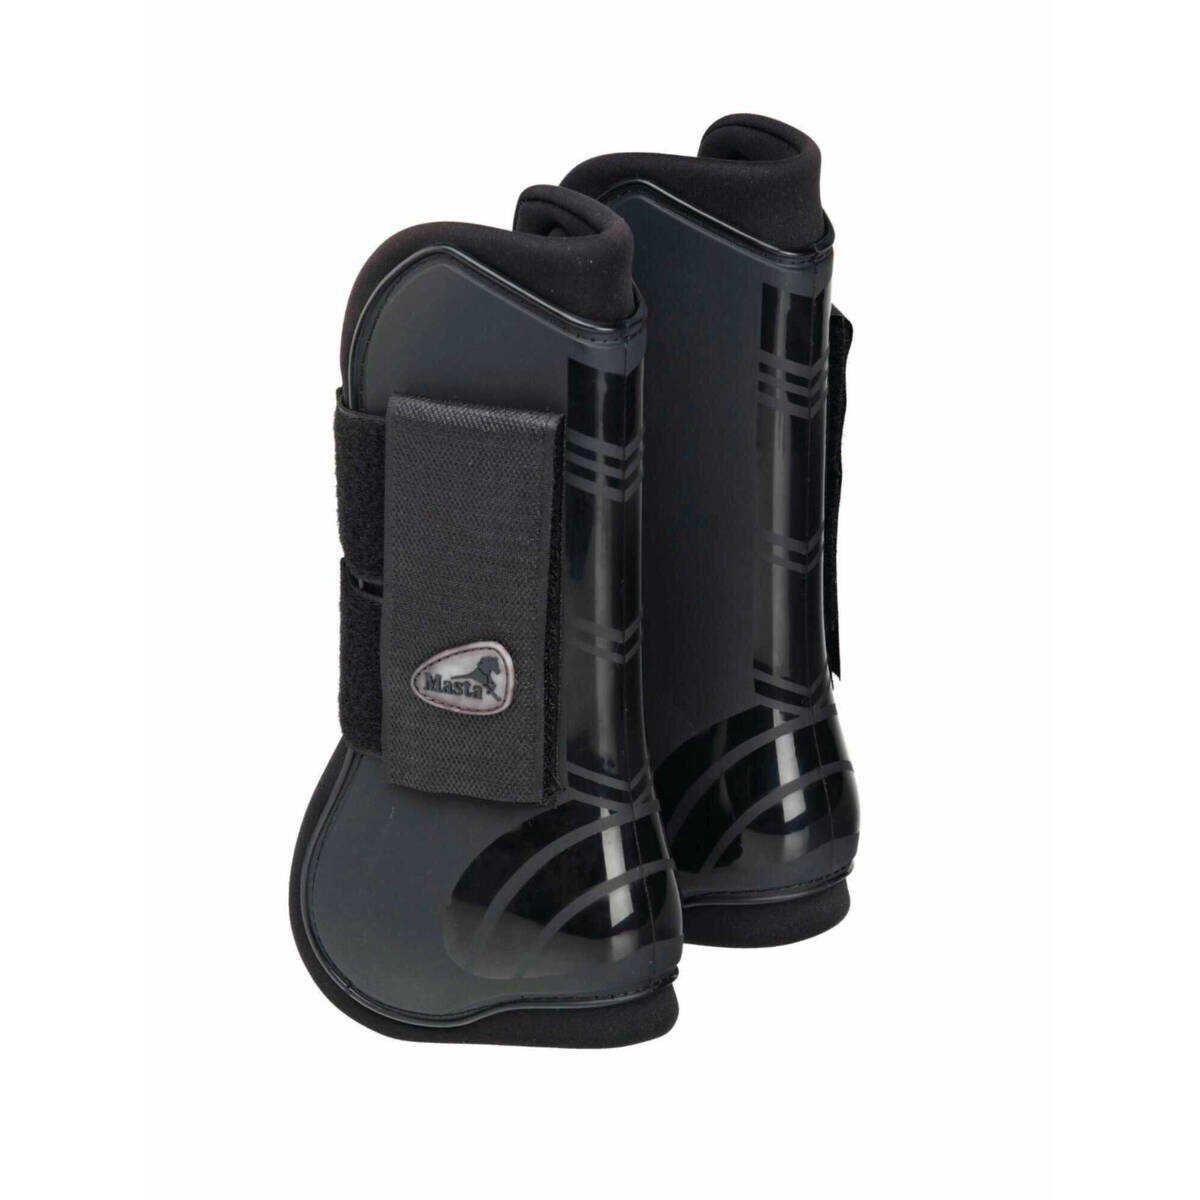 Masta Deluxe Open Tendon Boots